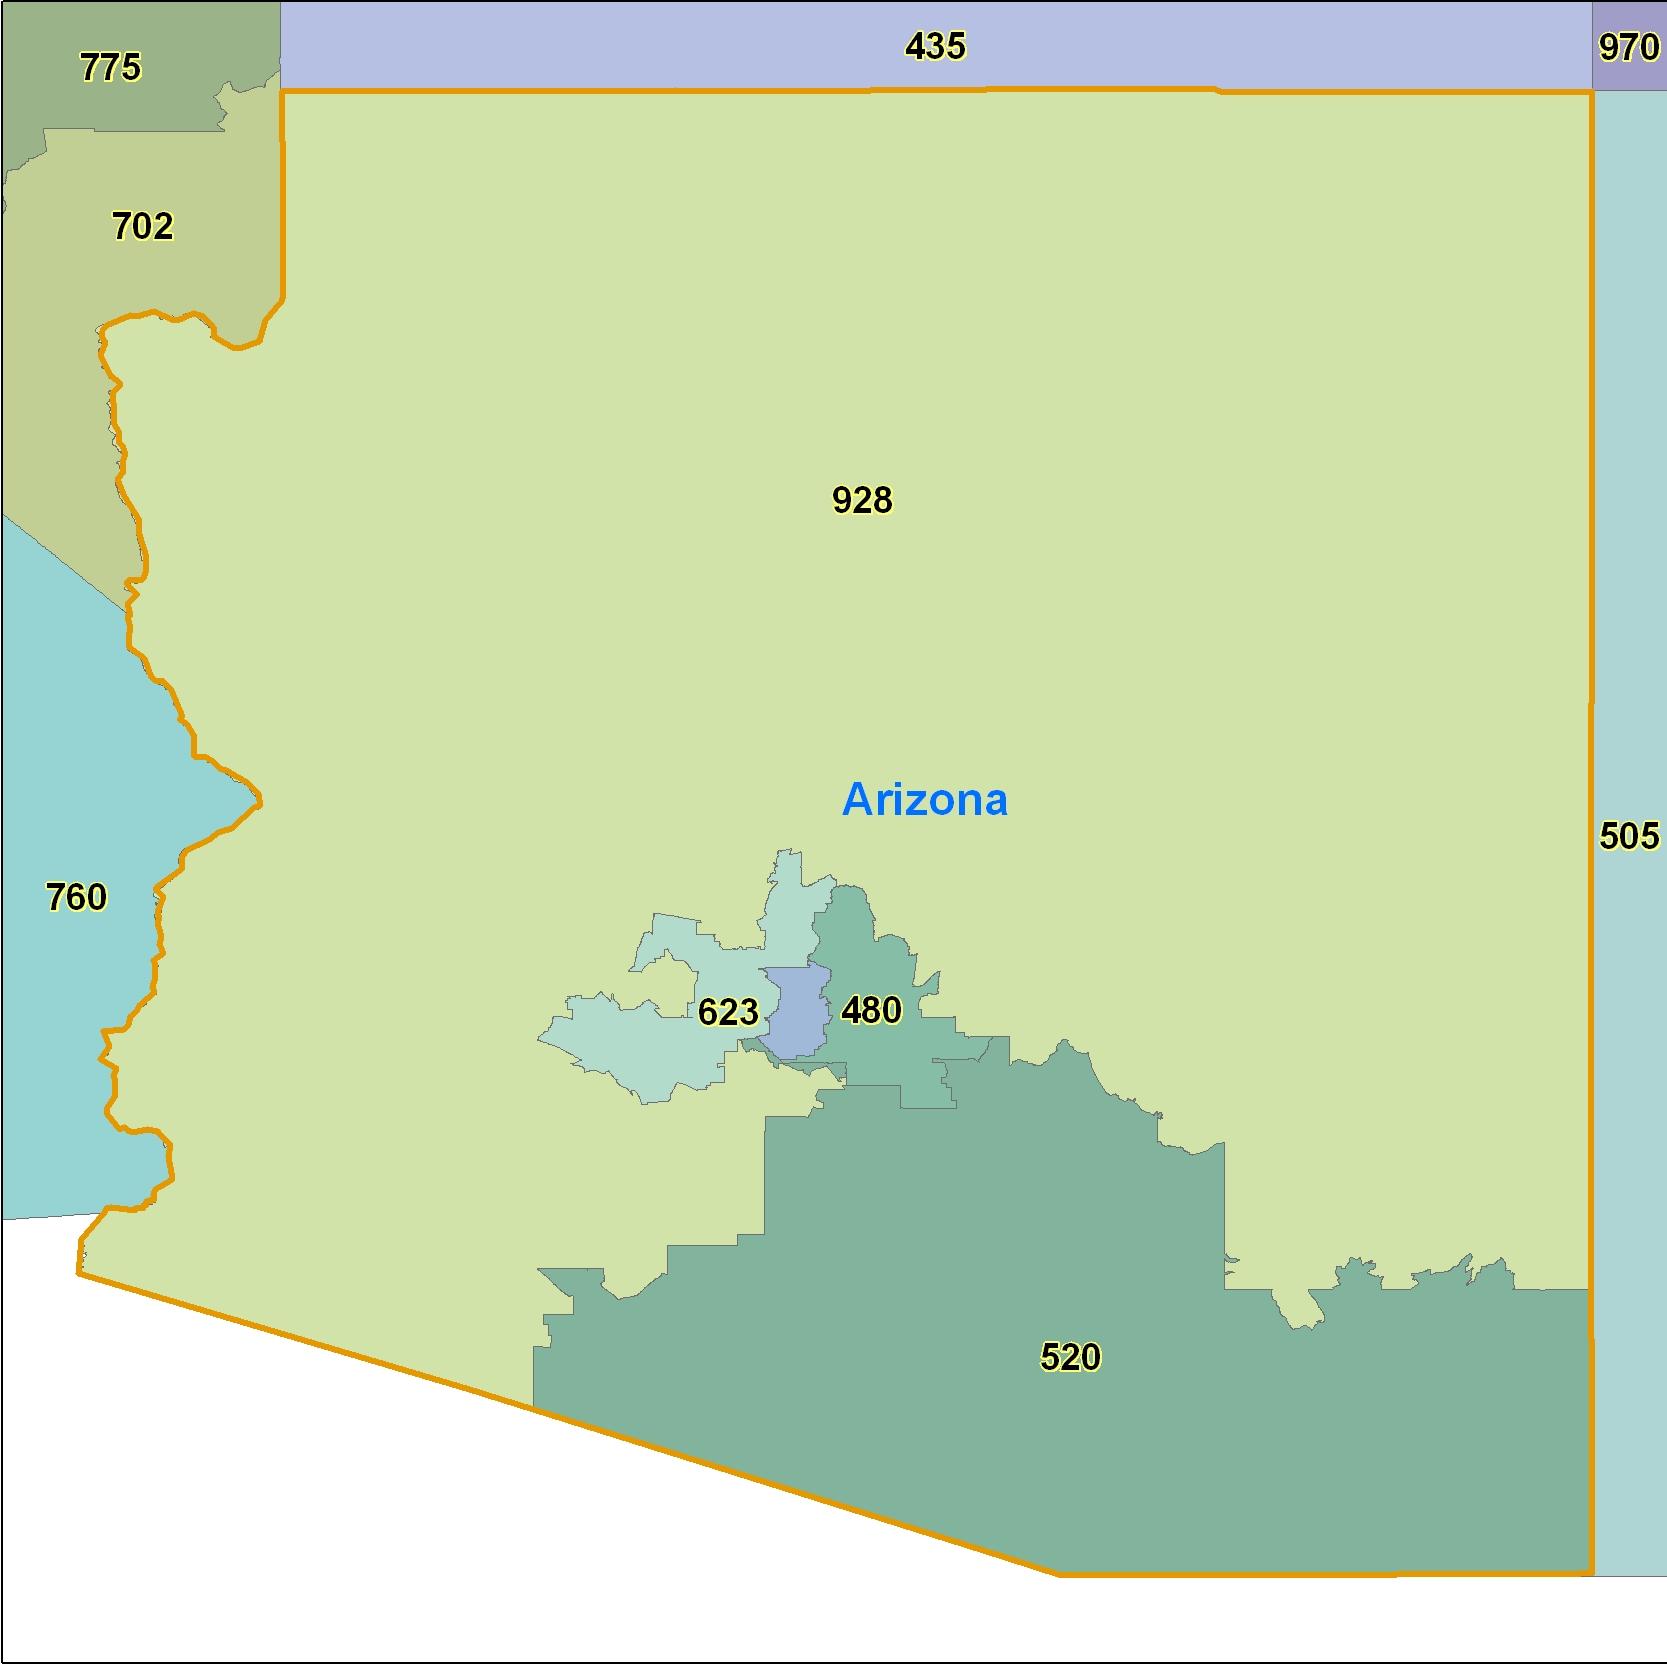 Arizona Area Code Maps Arizona Telephone Area Code Maps Free - 435 area code